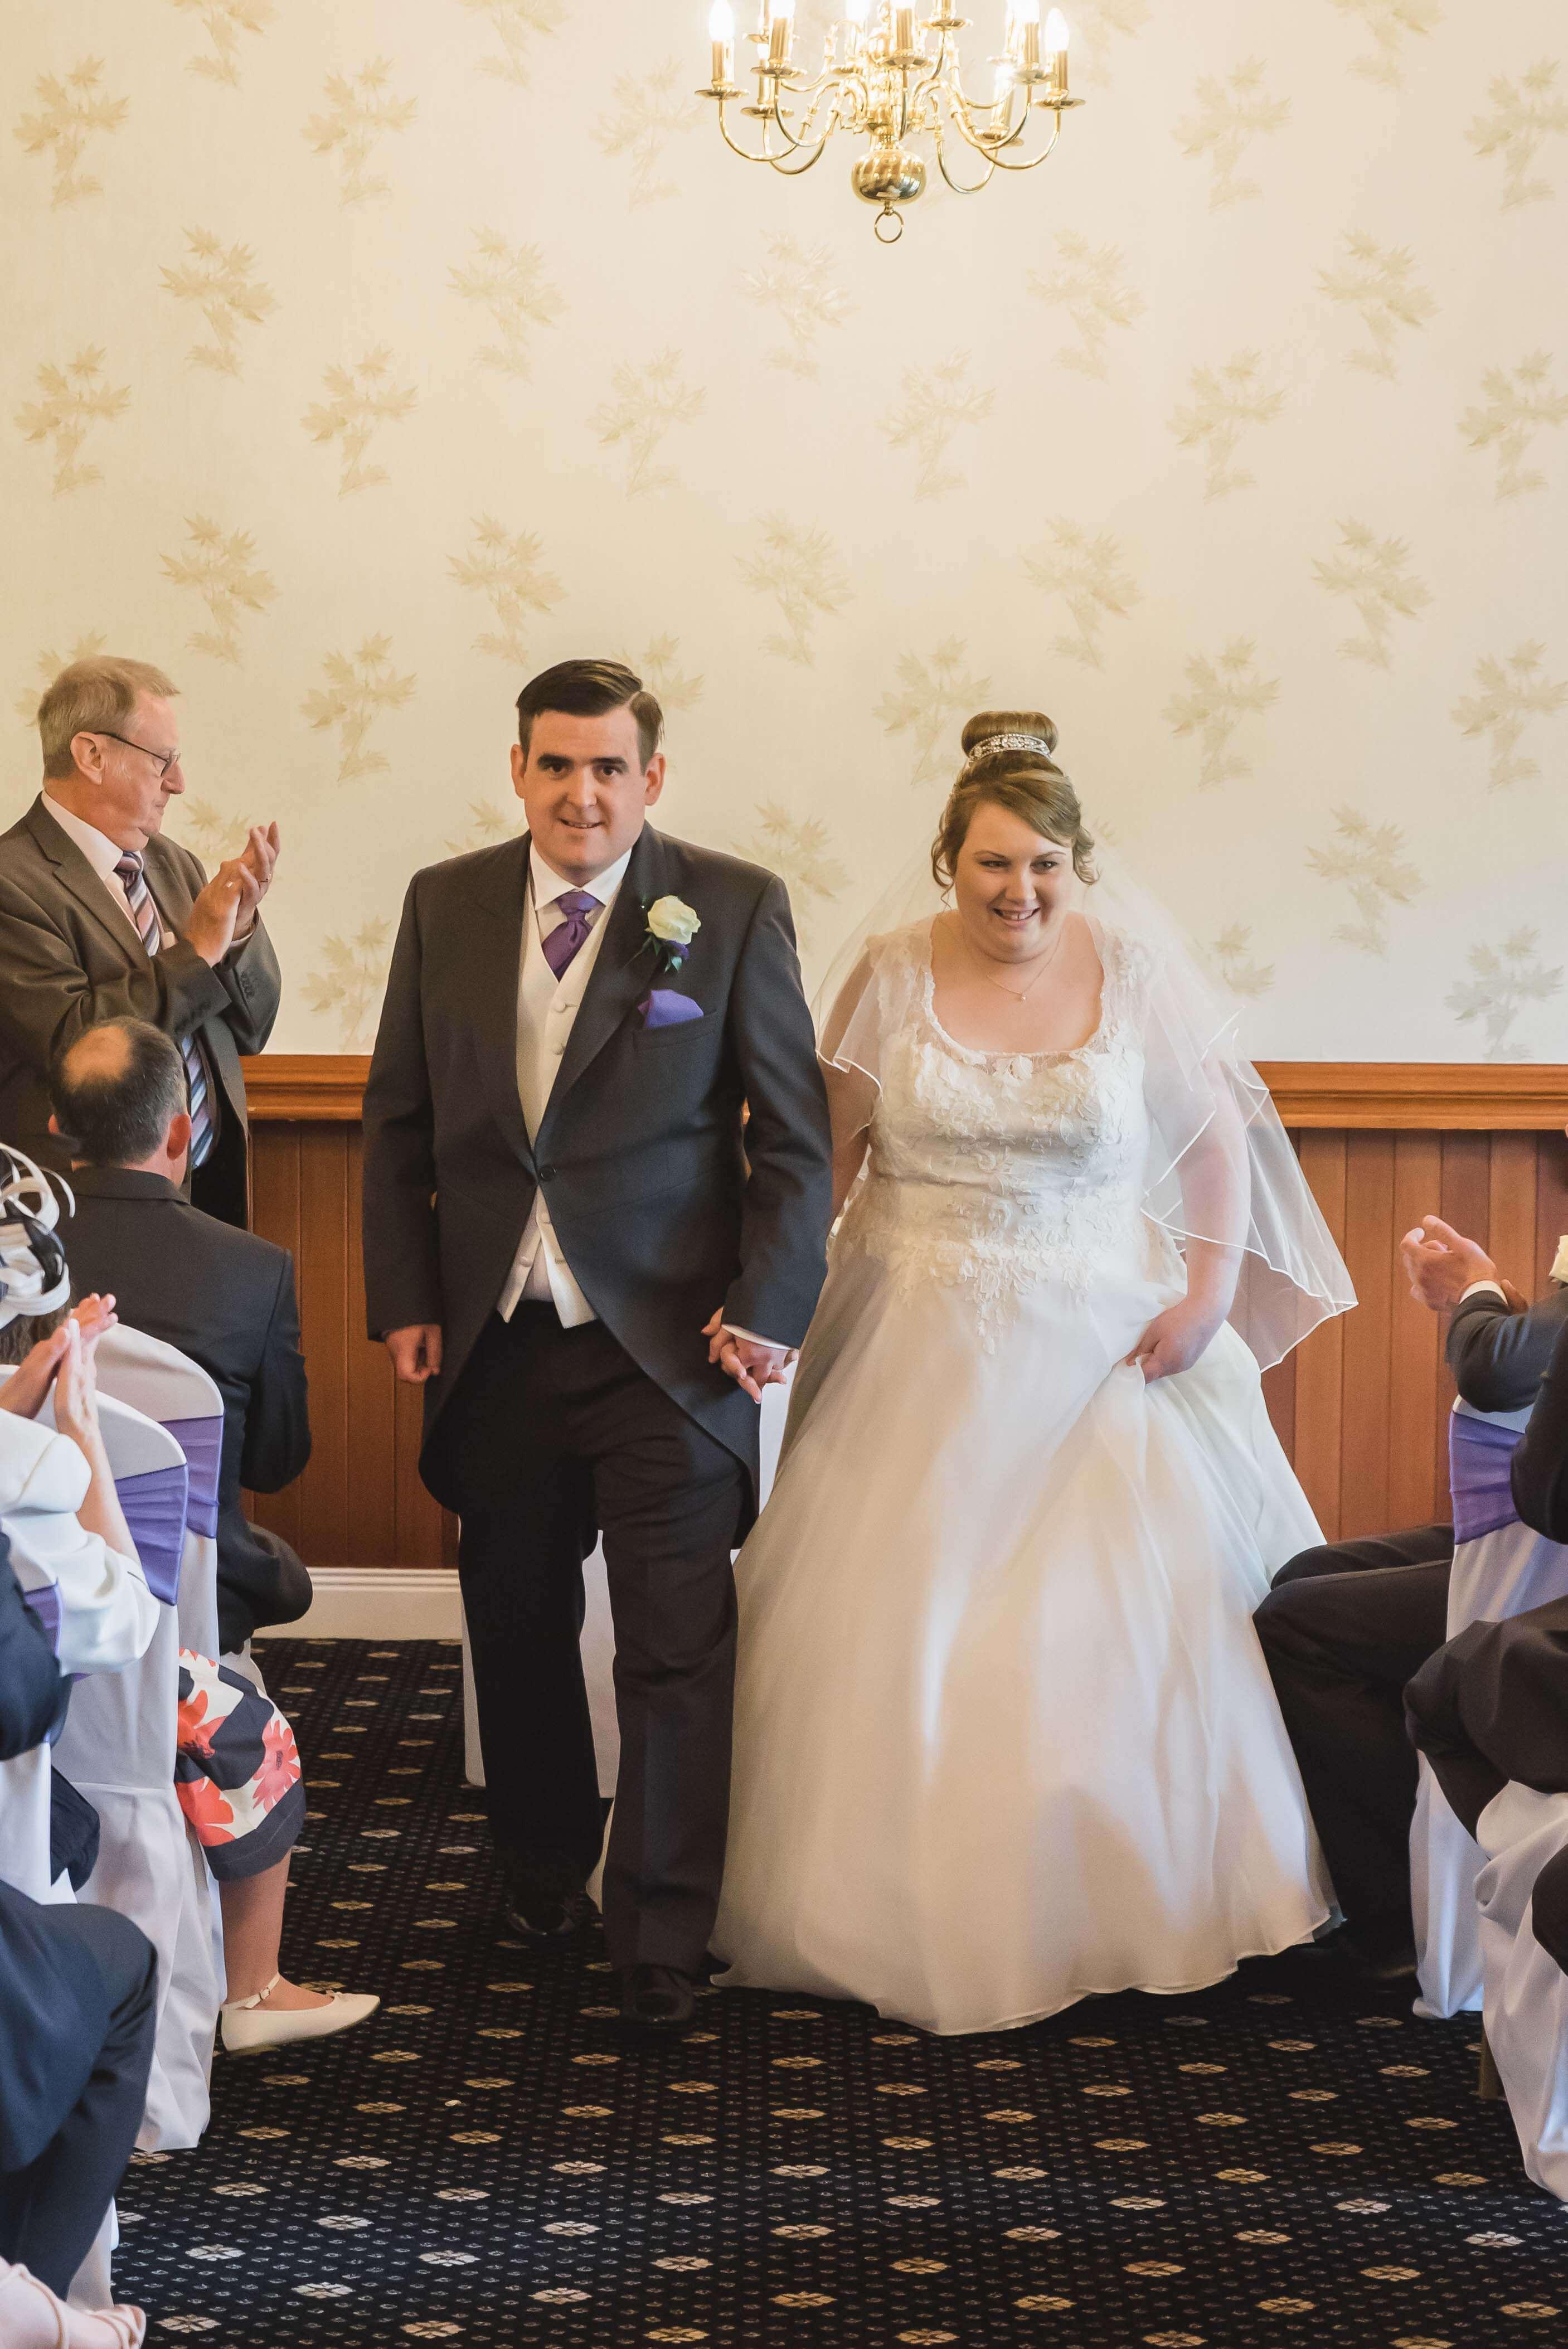 Barnsdale Hall Rutland Wedding 28 06 2017 22